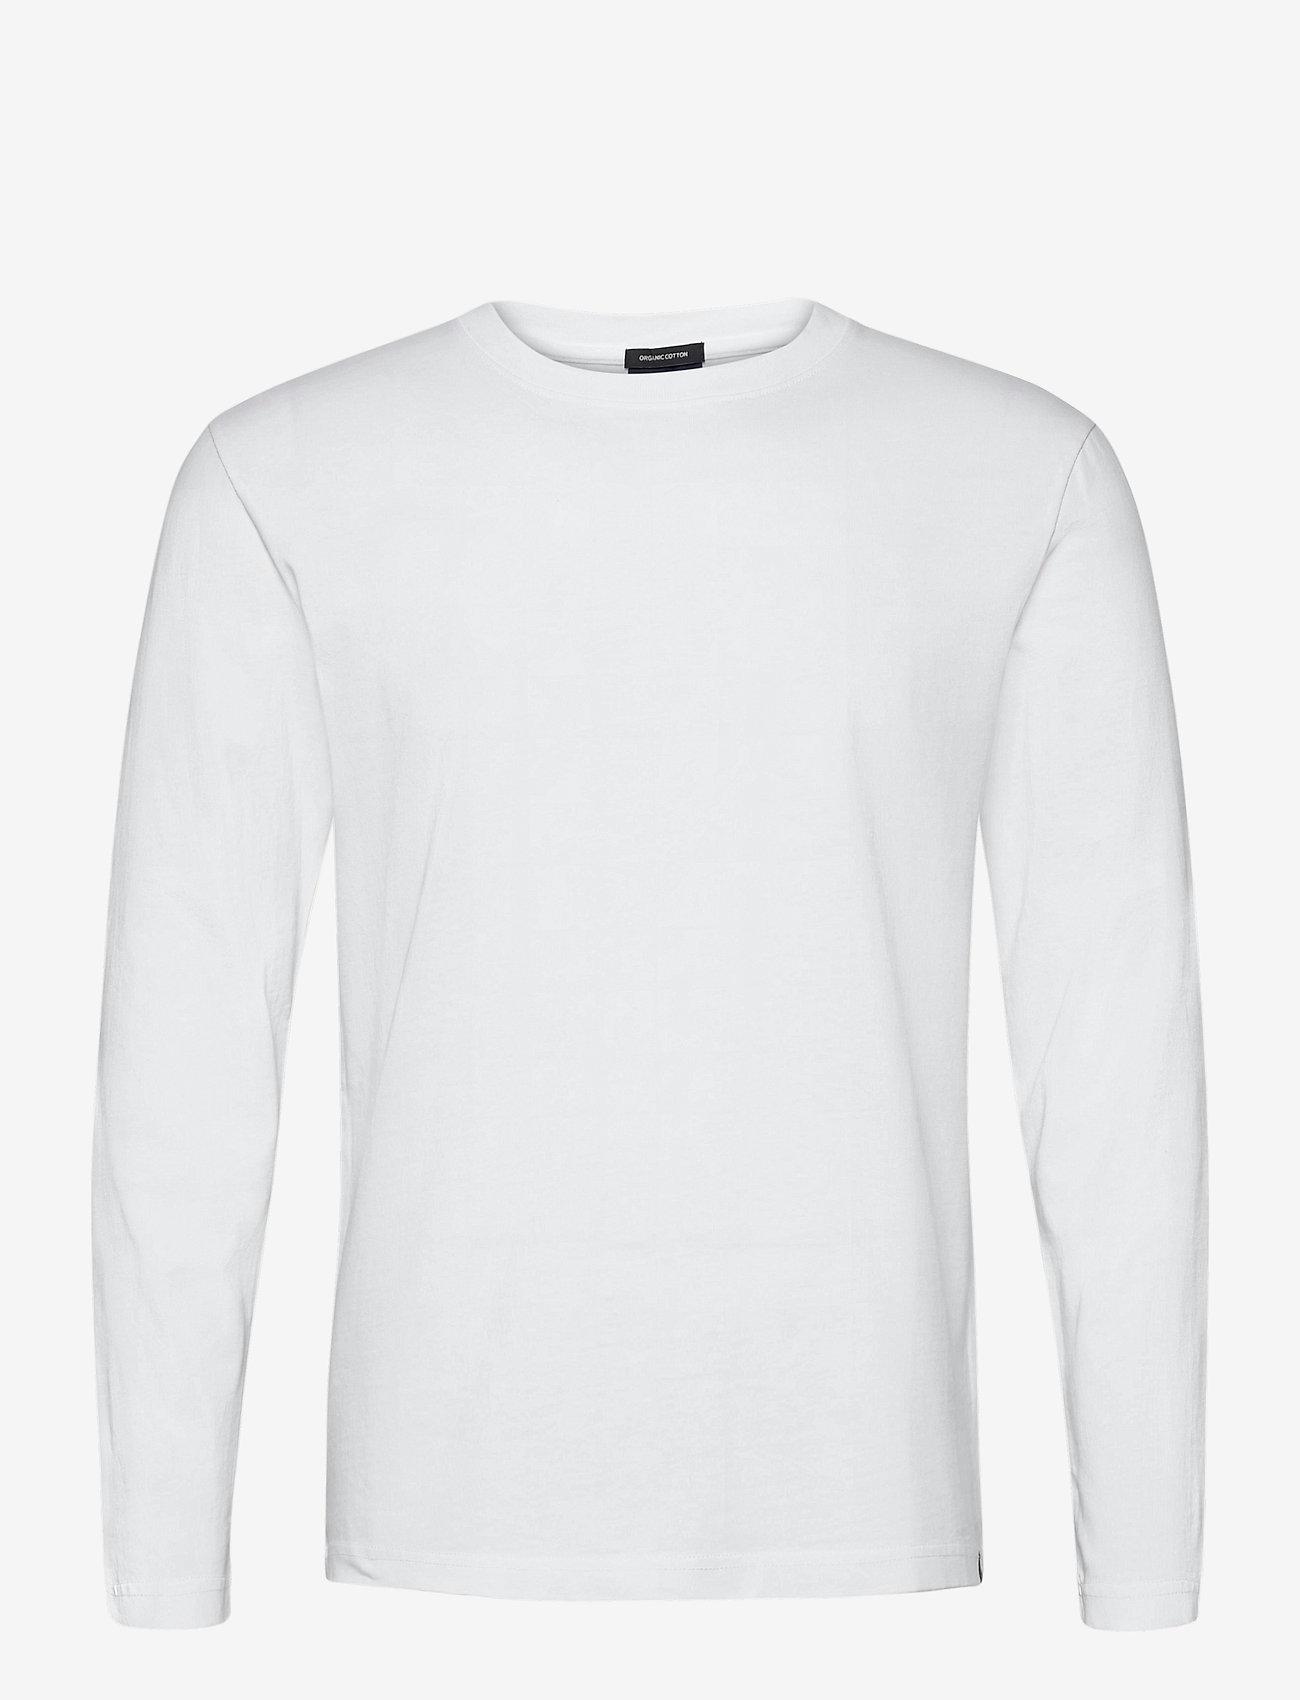 Scotch & Soda - Longsleeve tee in heavy organic cotton - basic t-shirts - denim white - 0